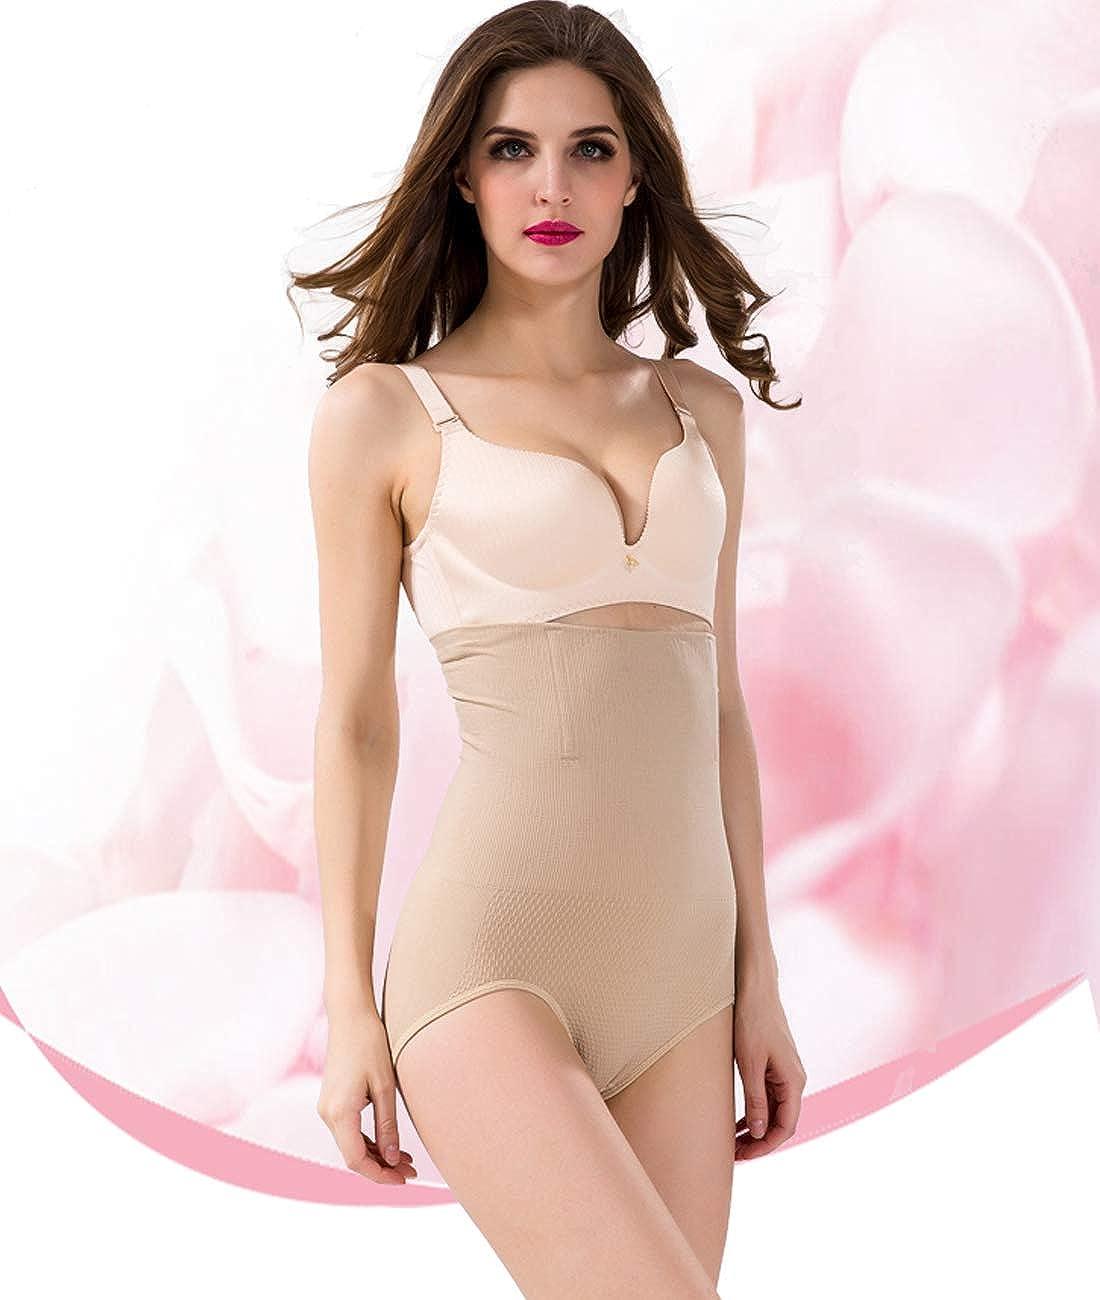 Sixyotie Donna Mutande Contenitive Vita Alta Control Panty Shapewear Intimo Modellante